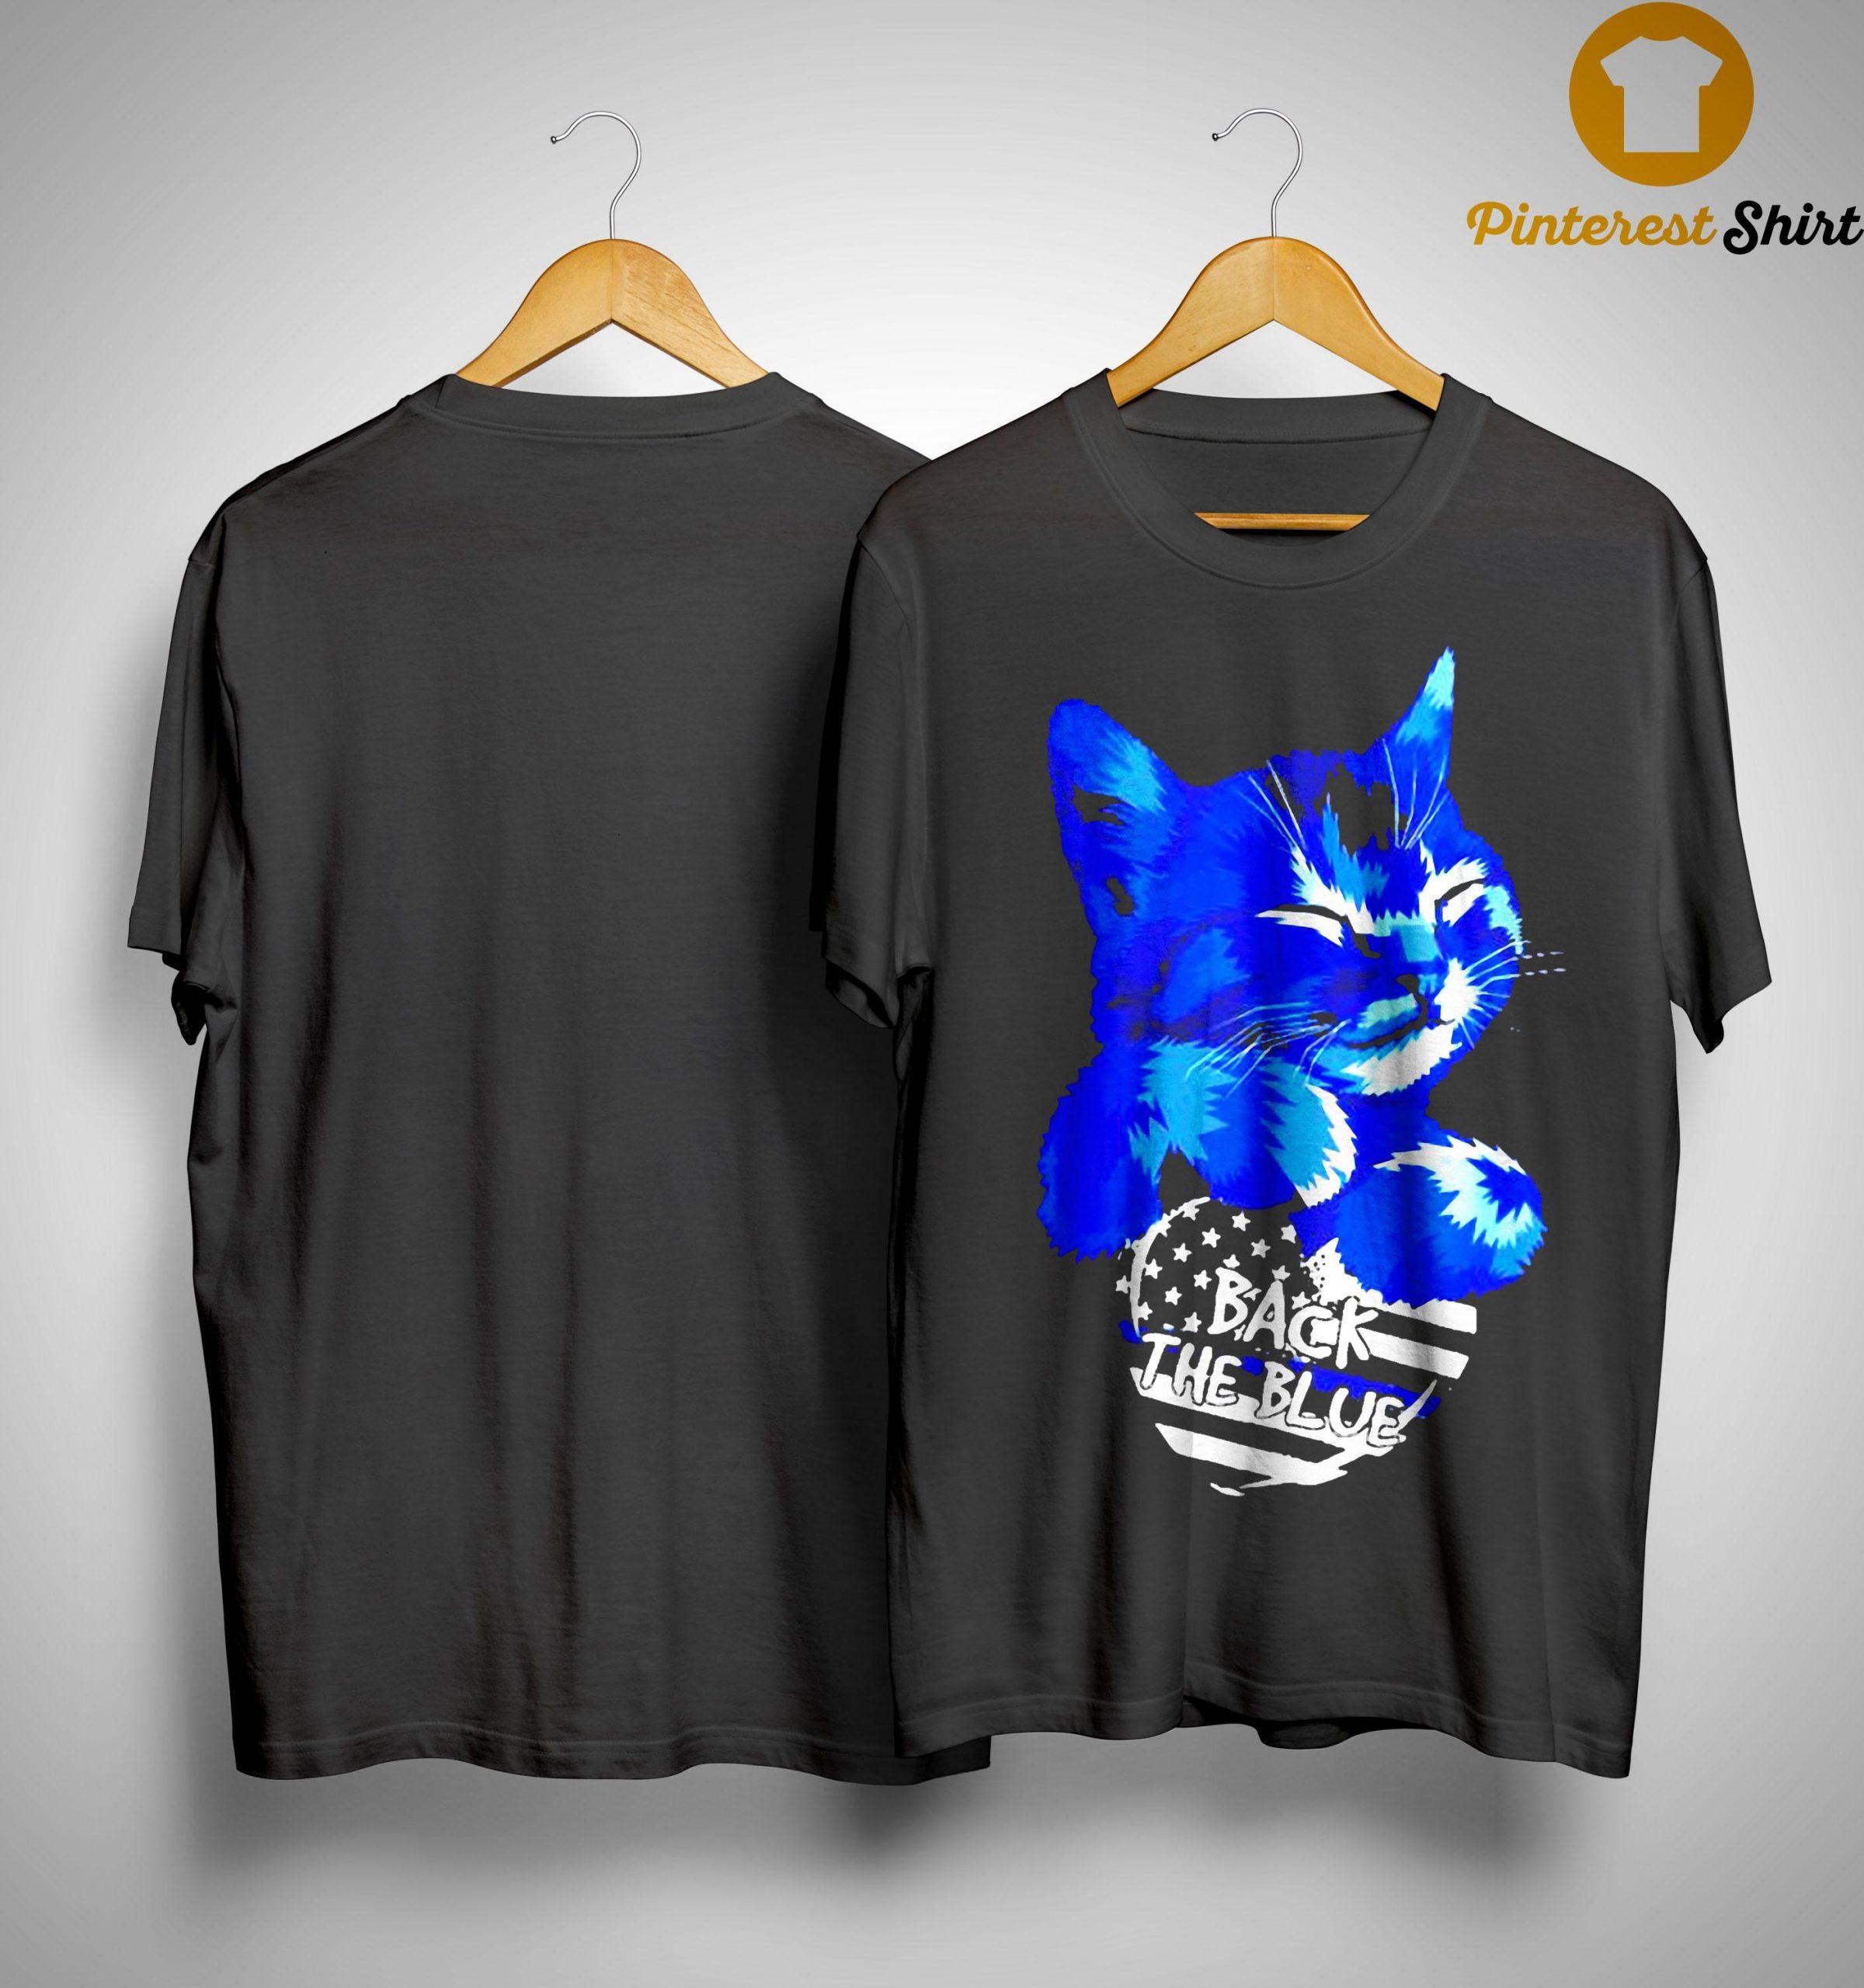 Cat Back The Blue Shirt